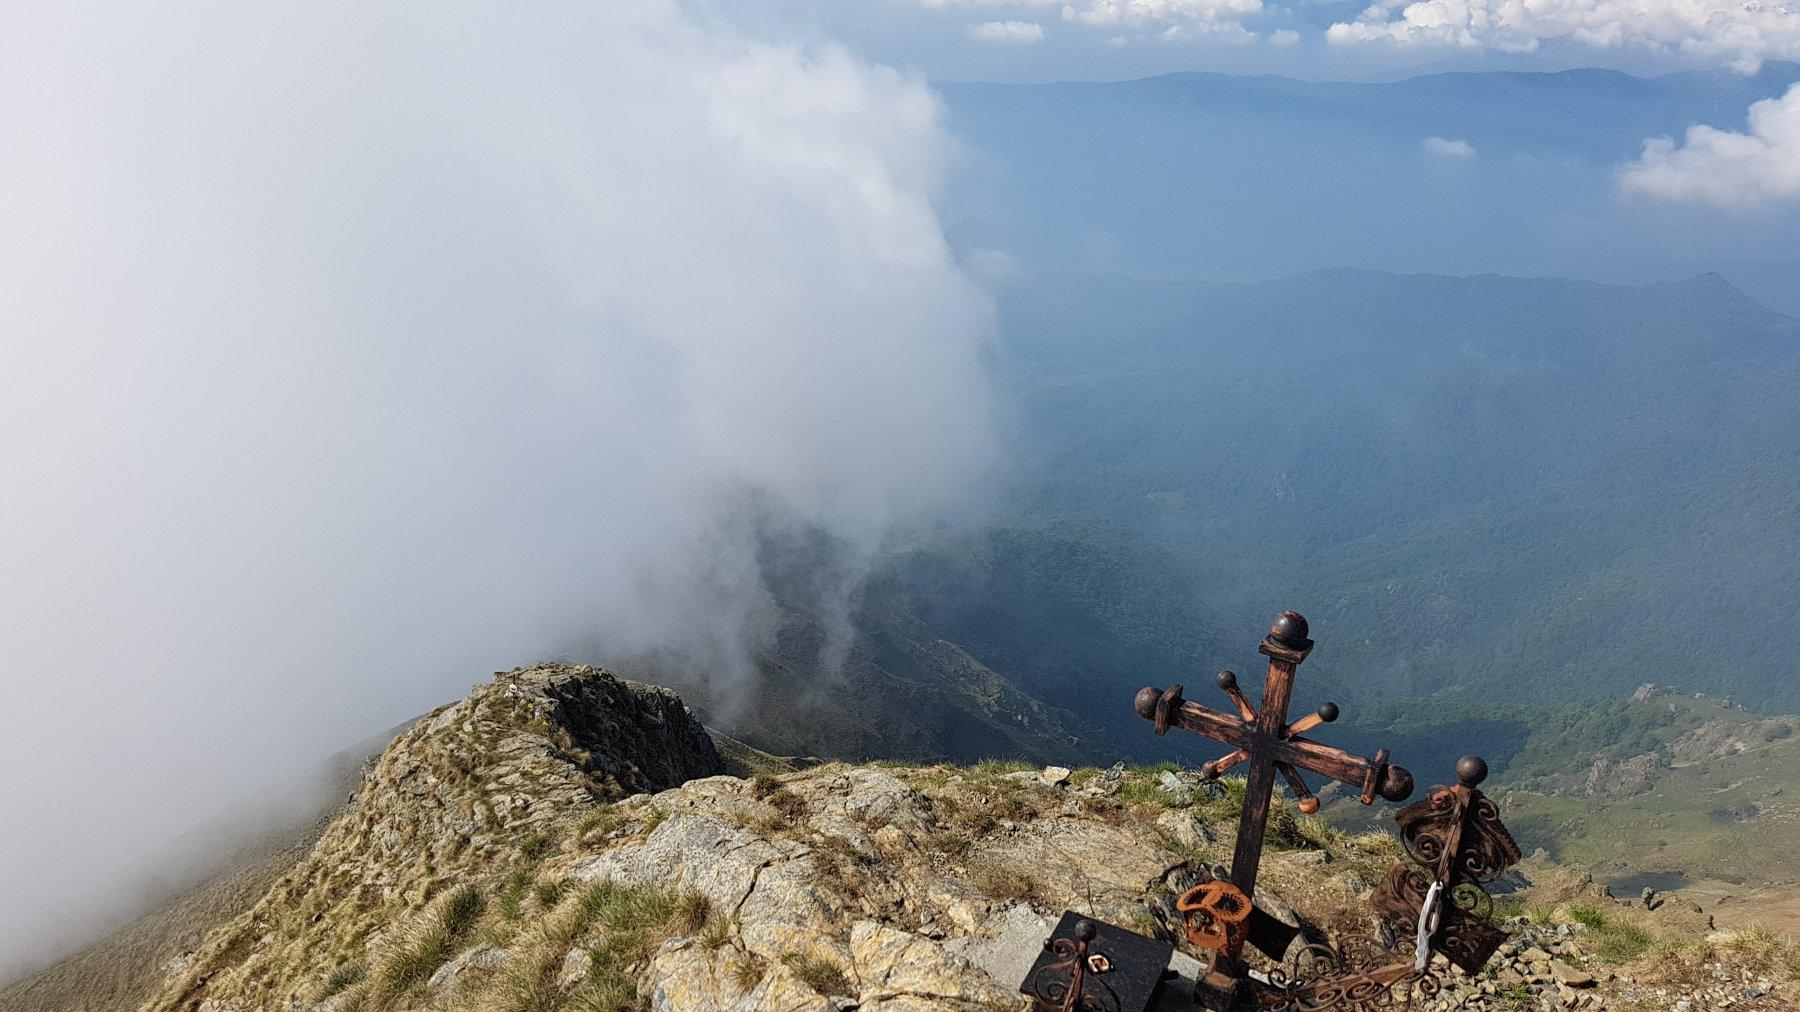 Nebbia in arrivo da Est